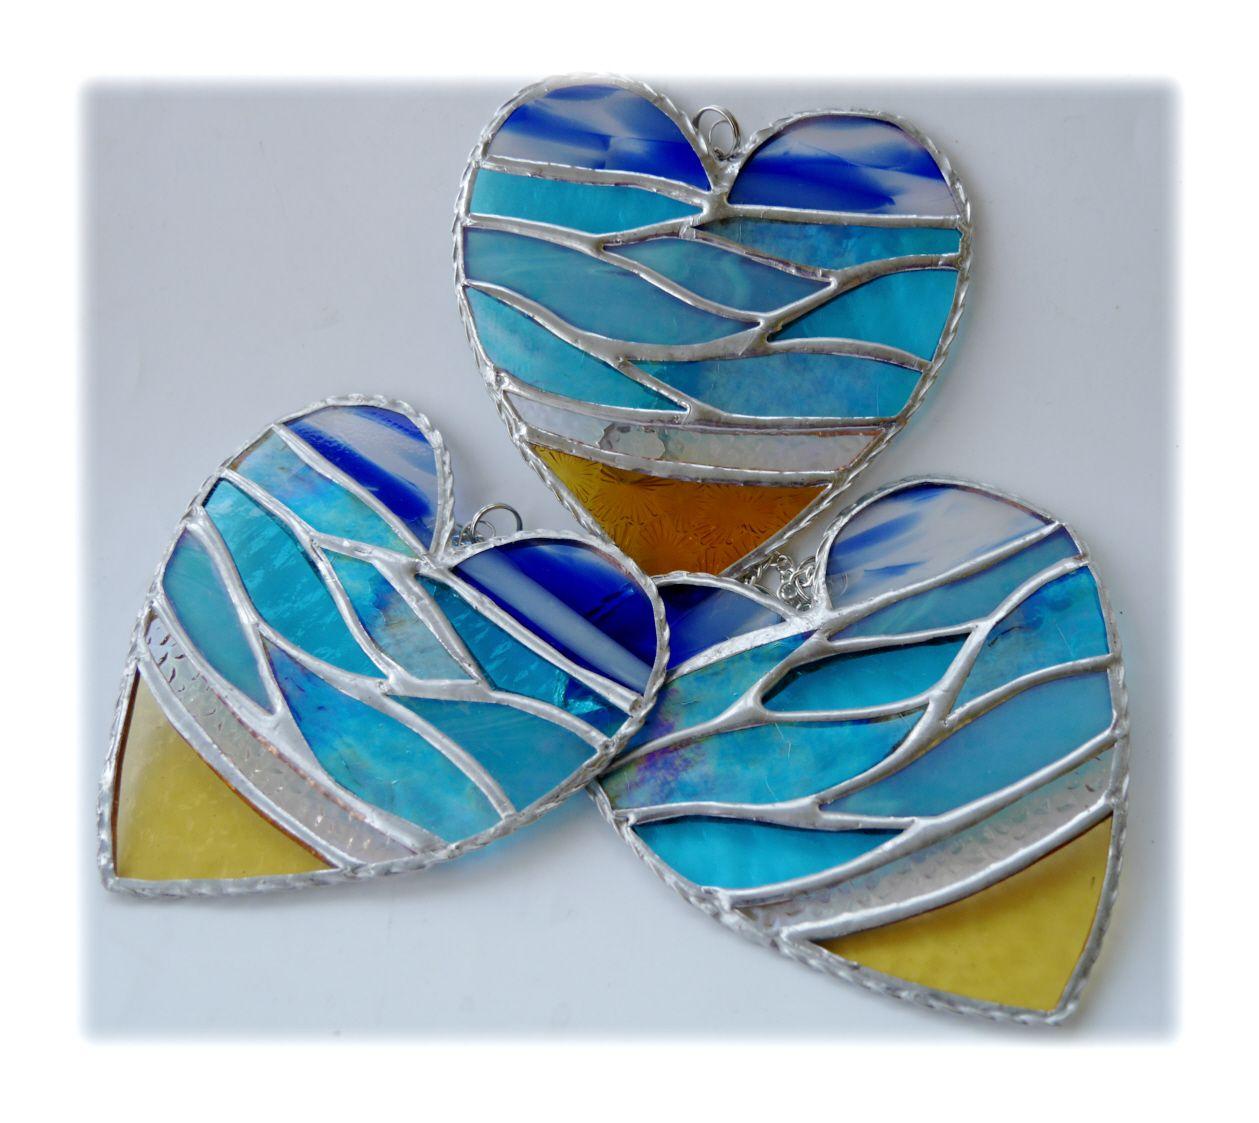 Sea Heart 033 #1903 FREE 15.00